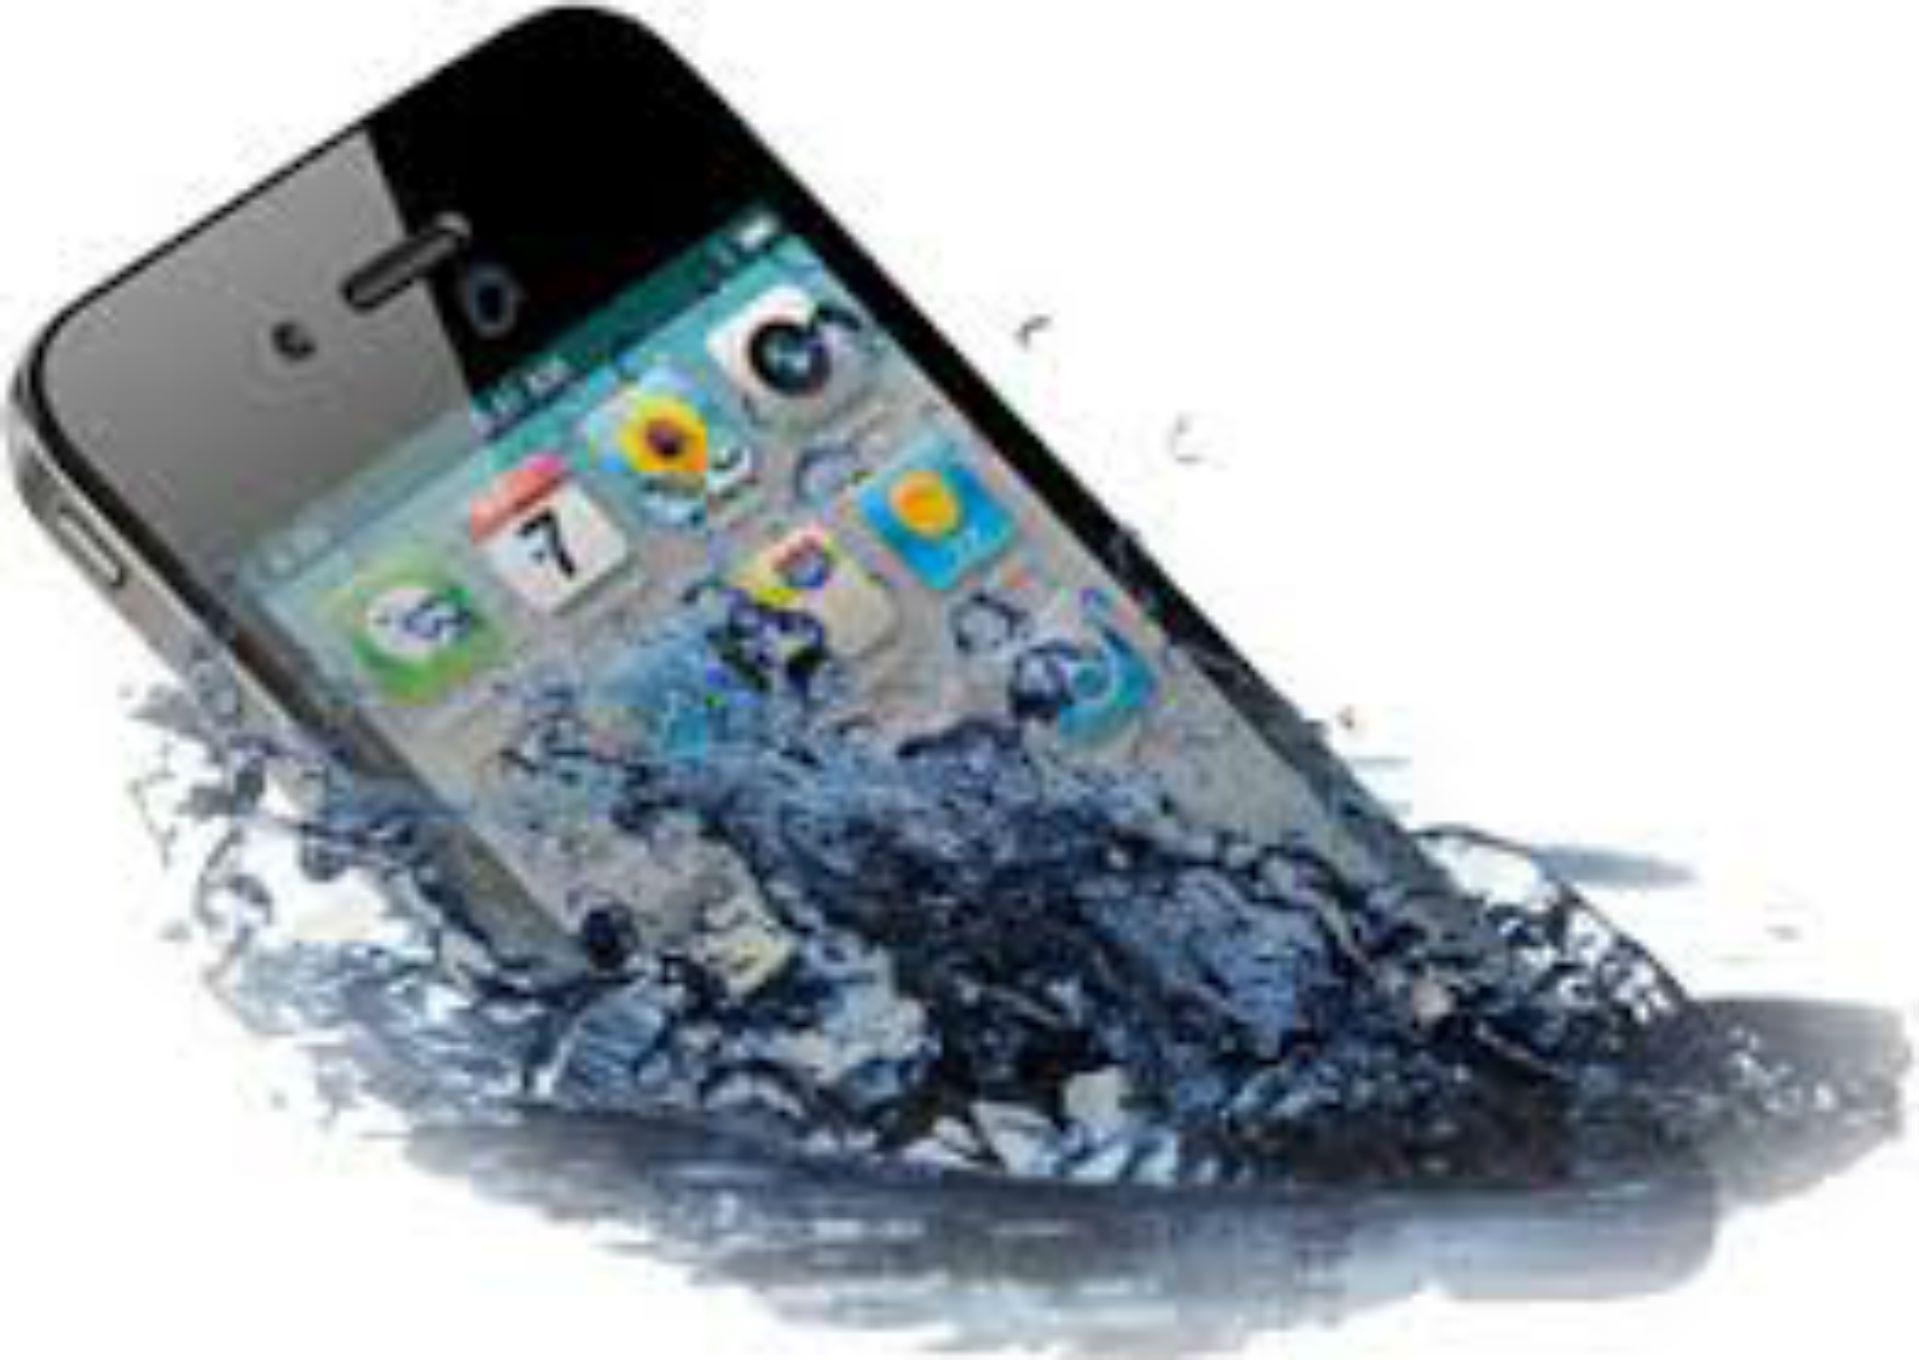 iPhone-mojado.jpg